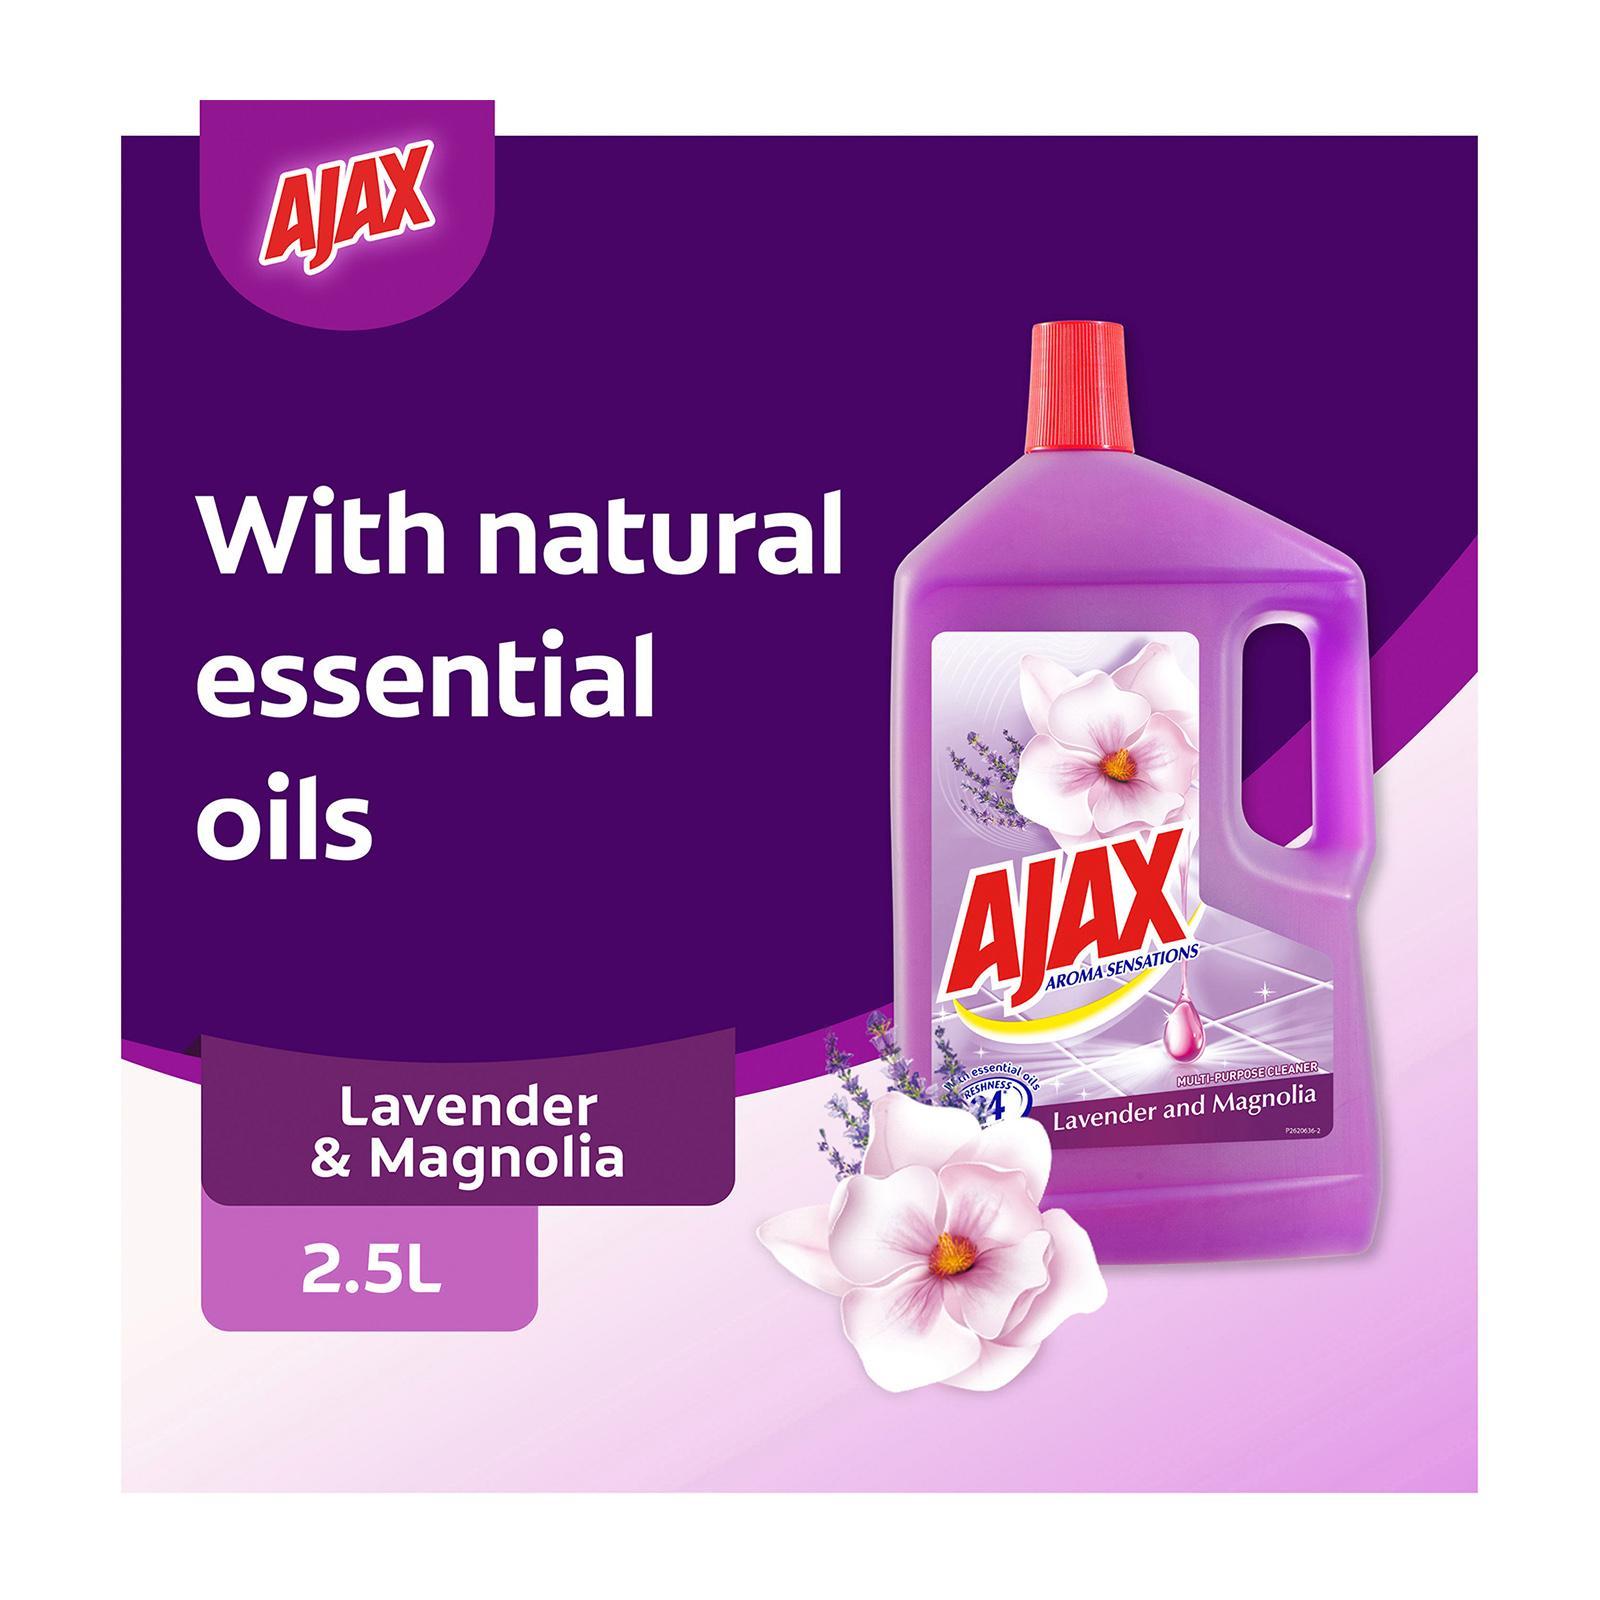 Ajax Aroma Sensations Lavender and Magnolia Antibacterial Multi Purpose Floor Cleaner 2.5L